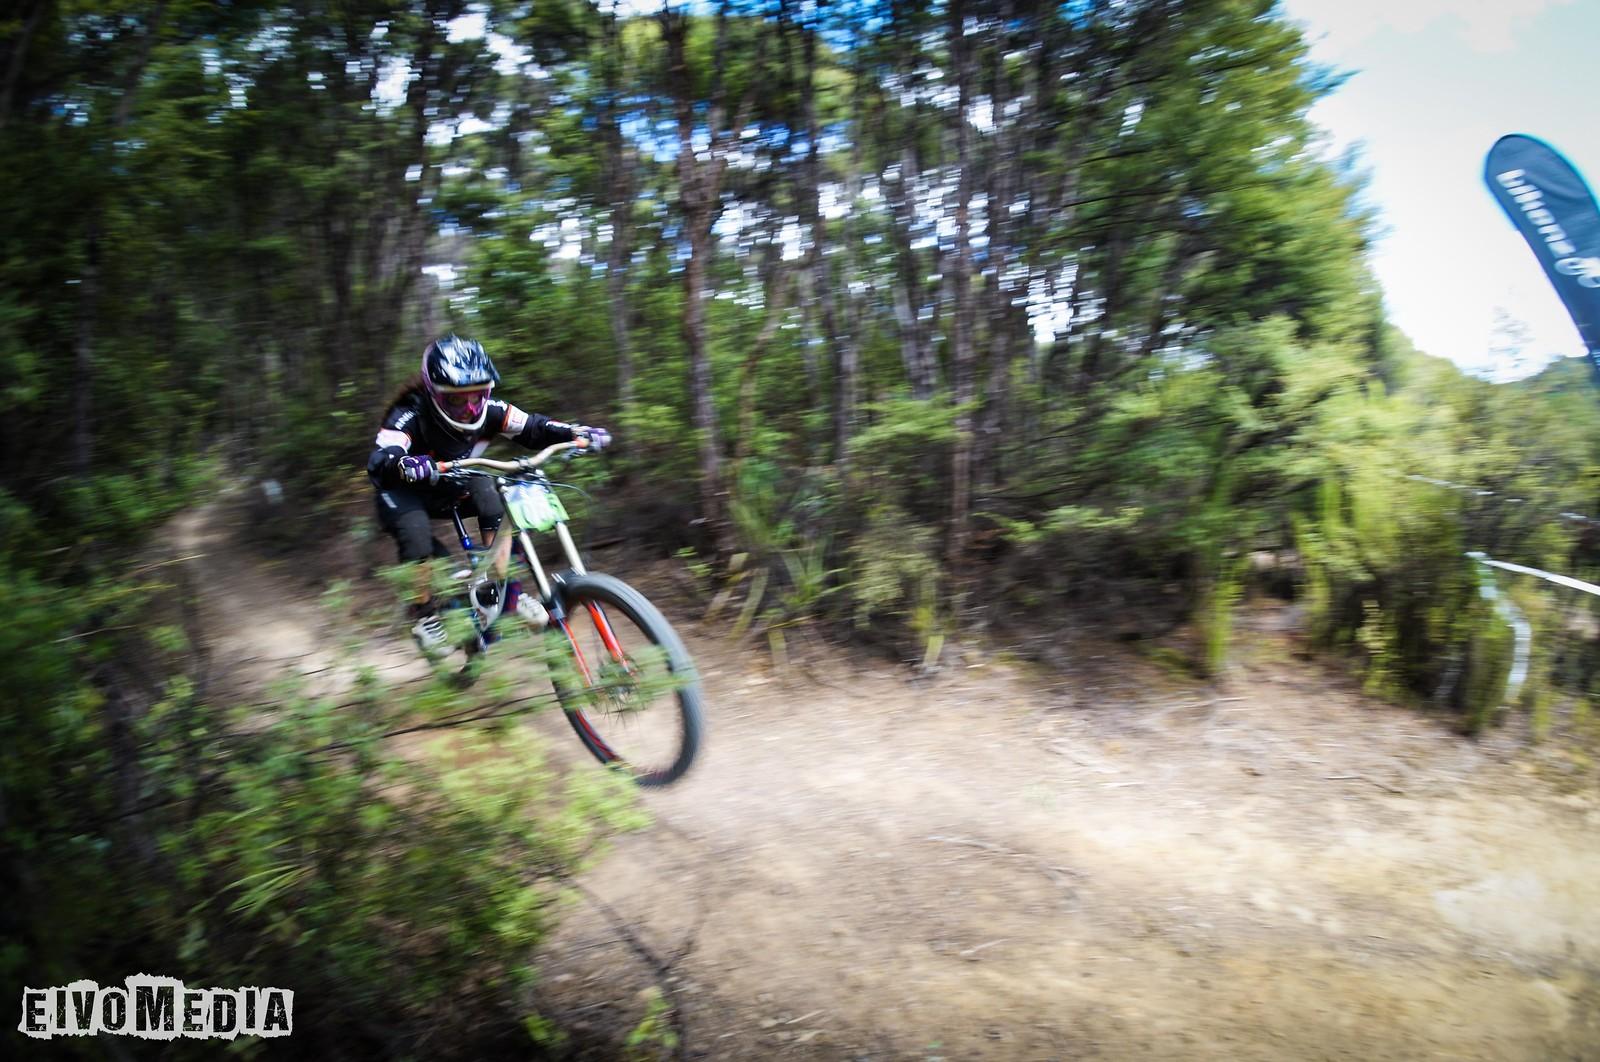 Hunua DH-24 - EIVOMEDIA - Mountain Biking Pictures - Vital MTB